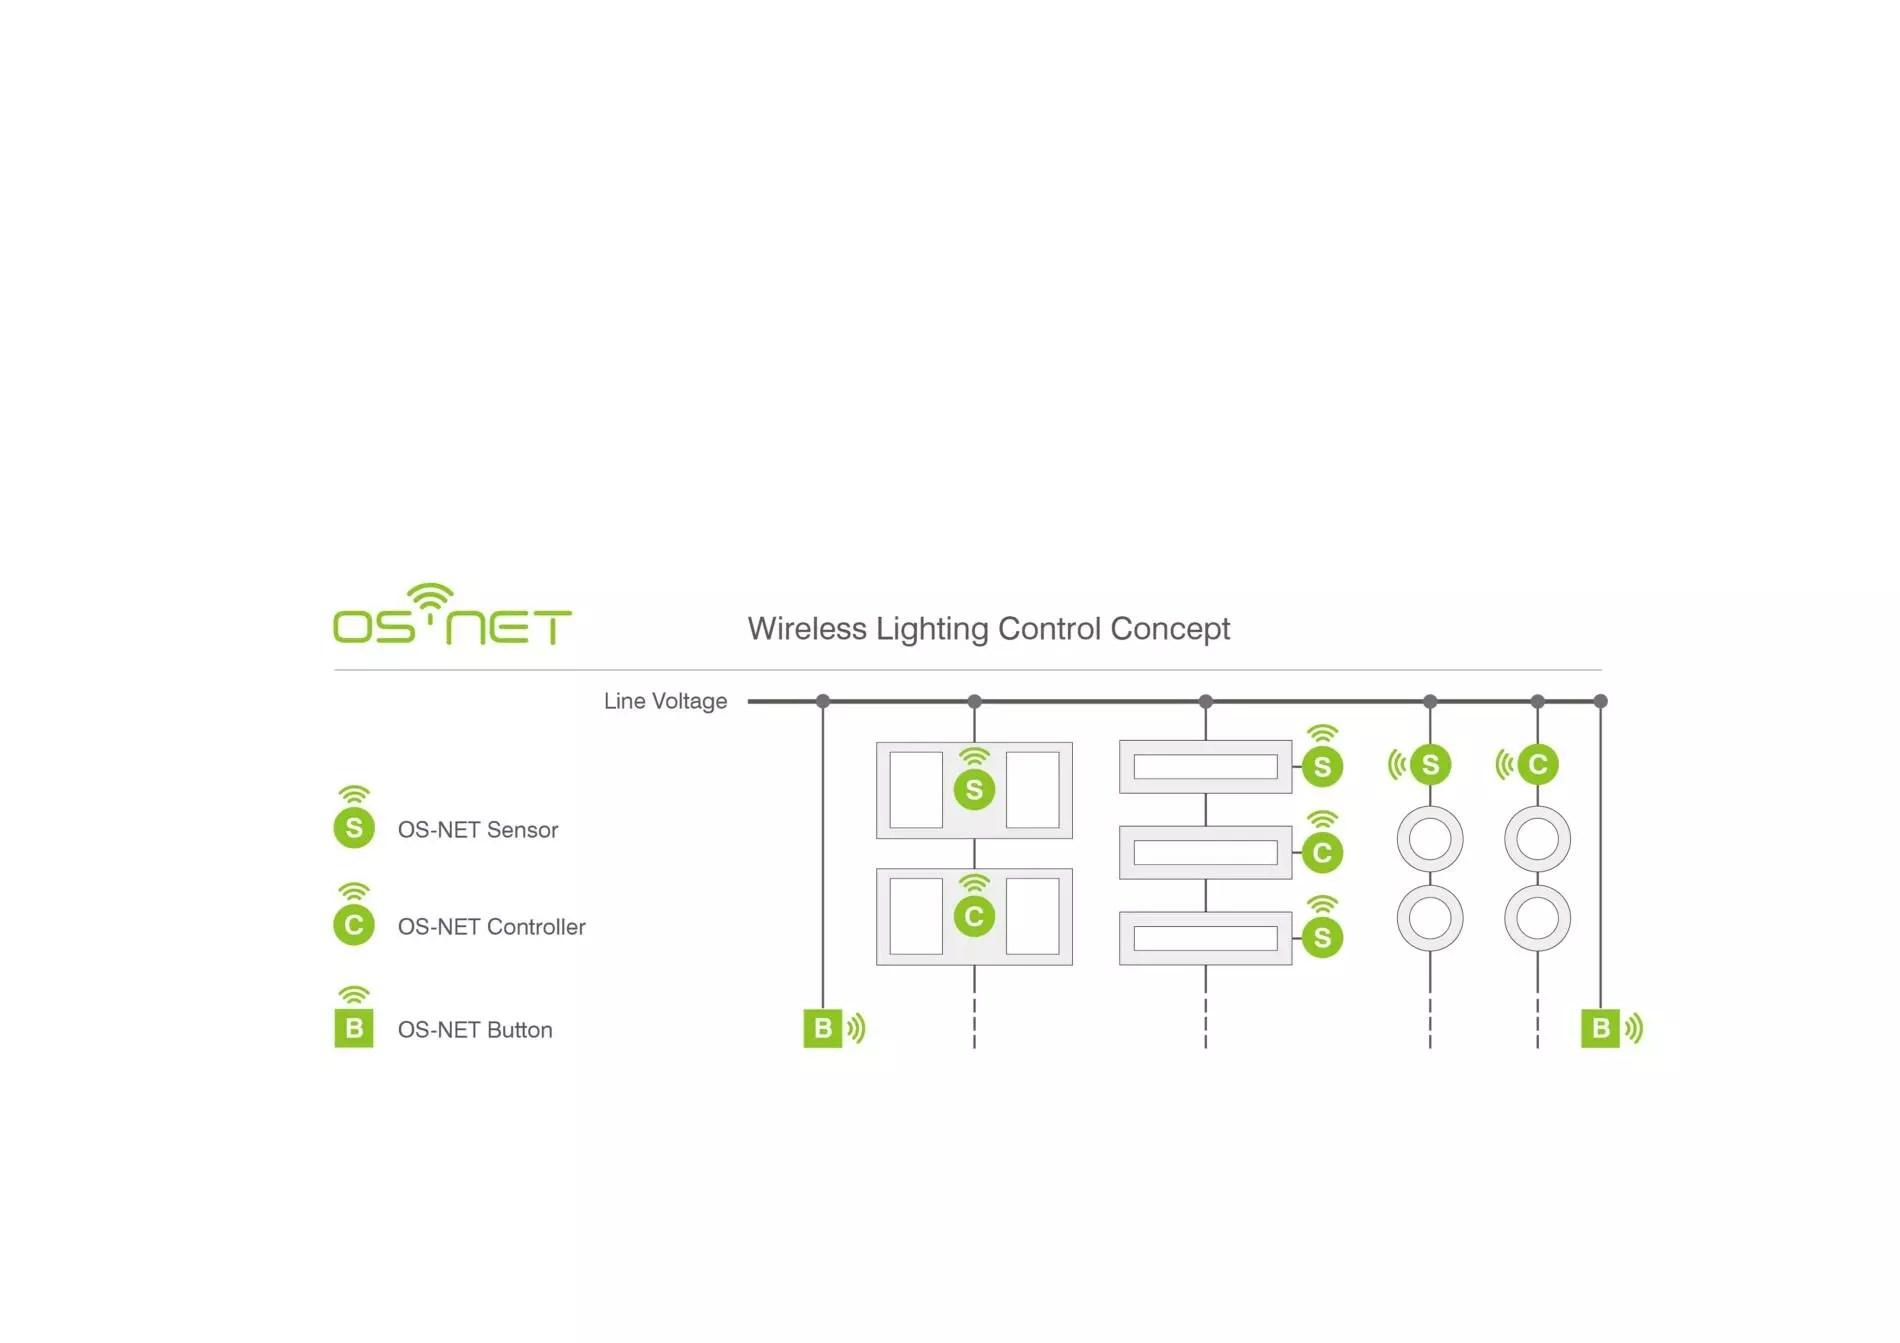 IR-TEC introduces OS-NET, A Simpler and Smarter Wireless